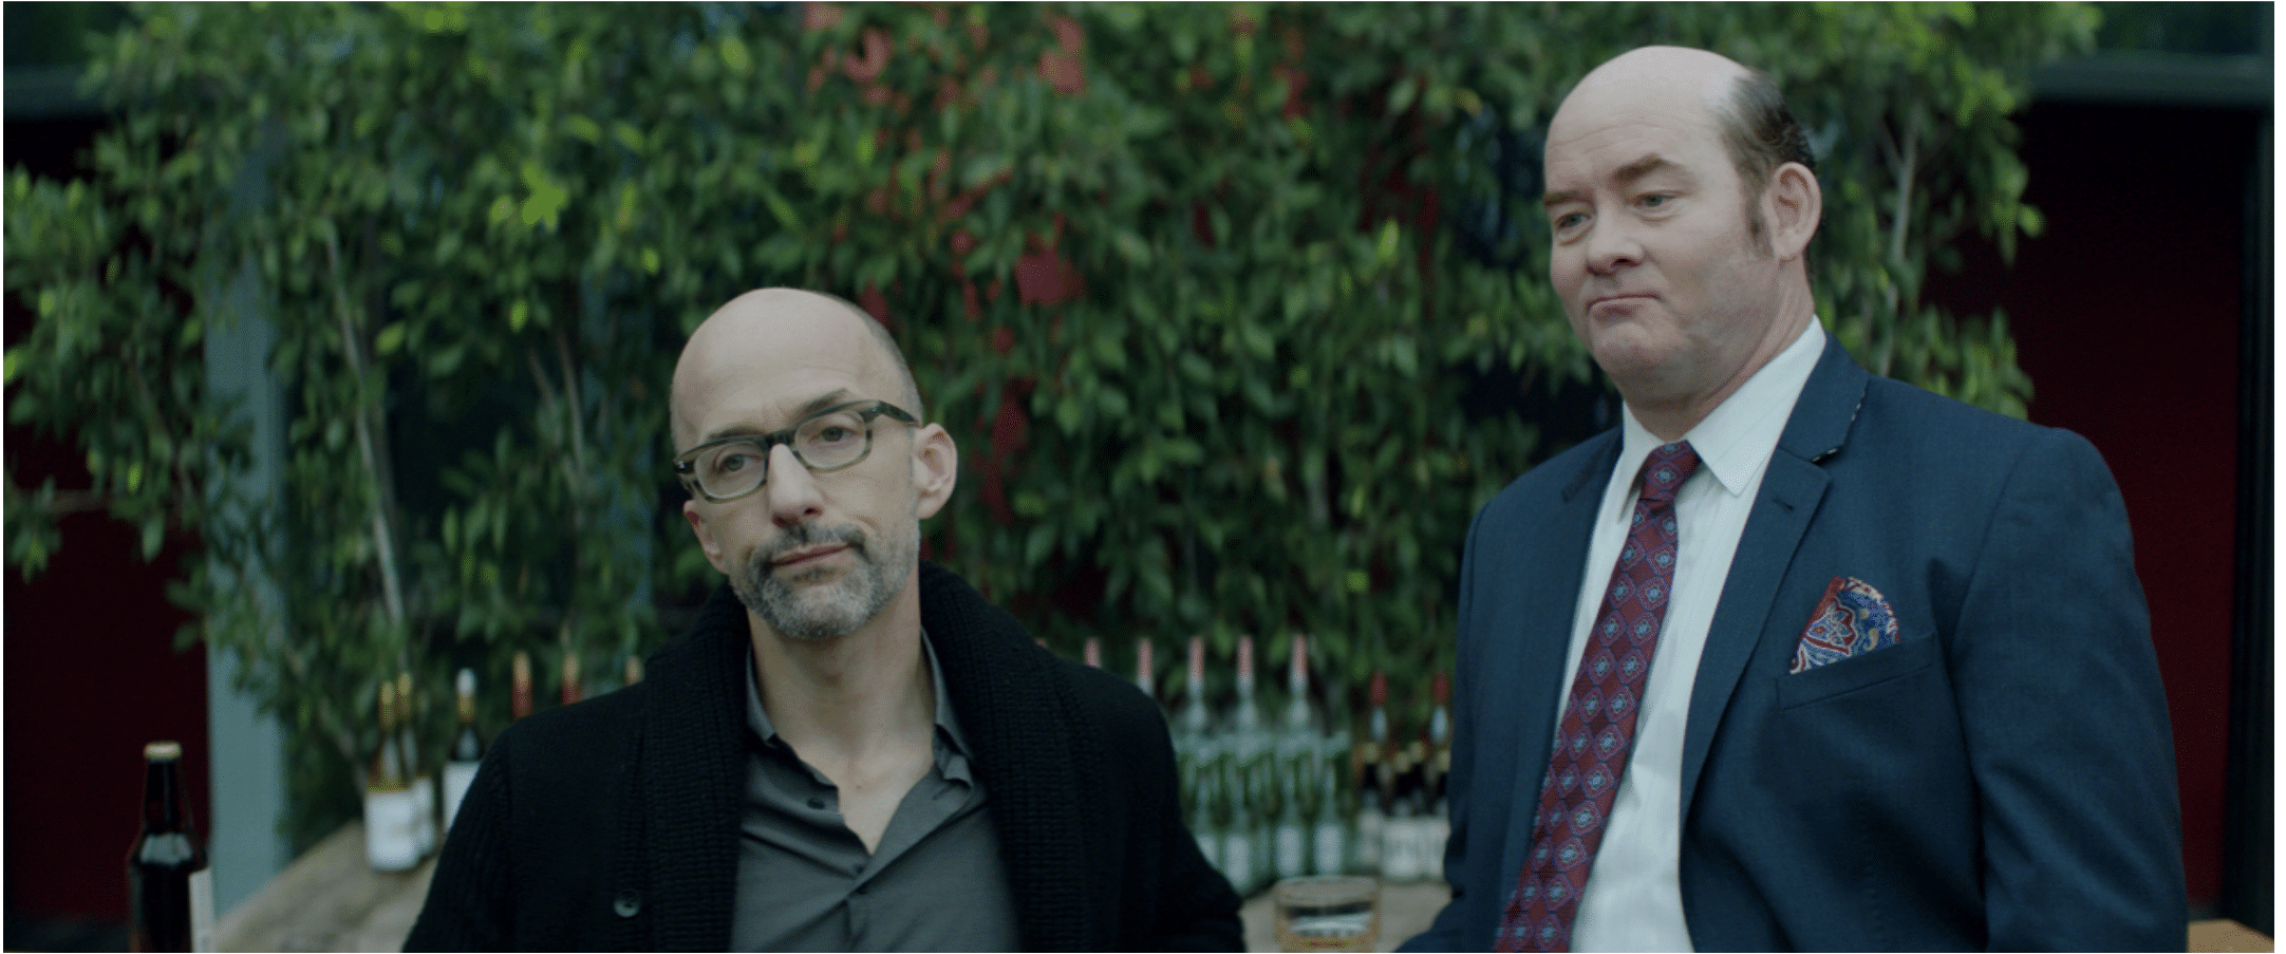 Bernard and Huey | Slamdance Film Festival